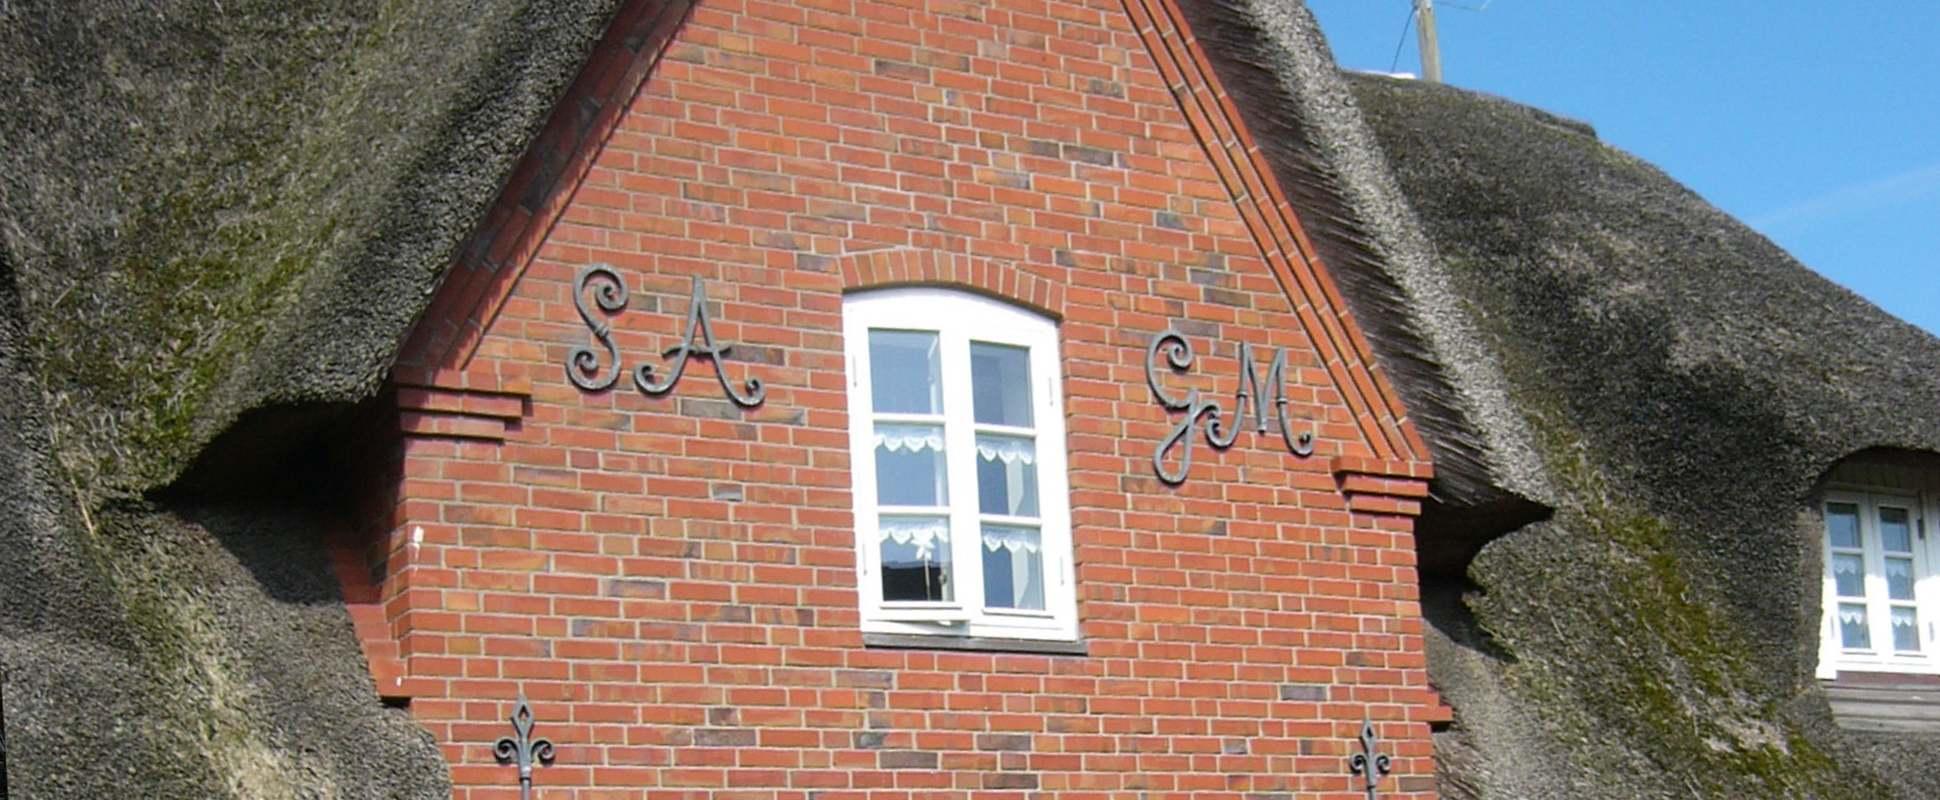 Reetdachhaus in Norddorf Üüs Lok